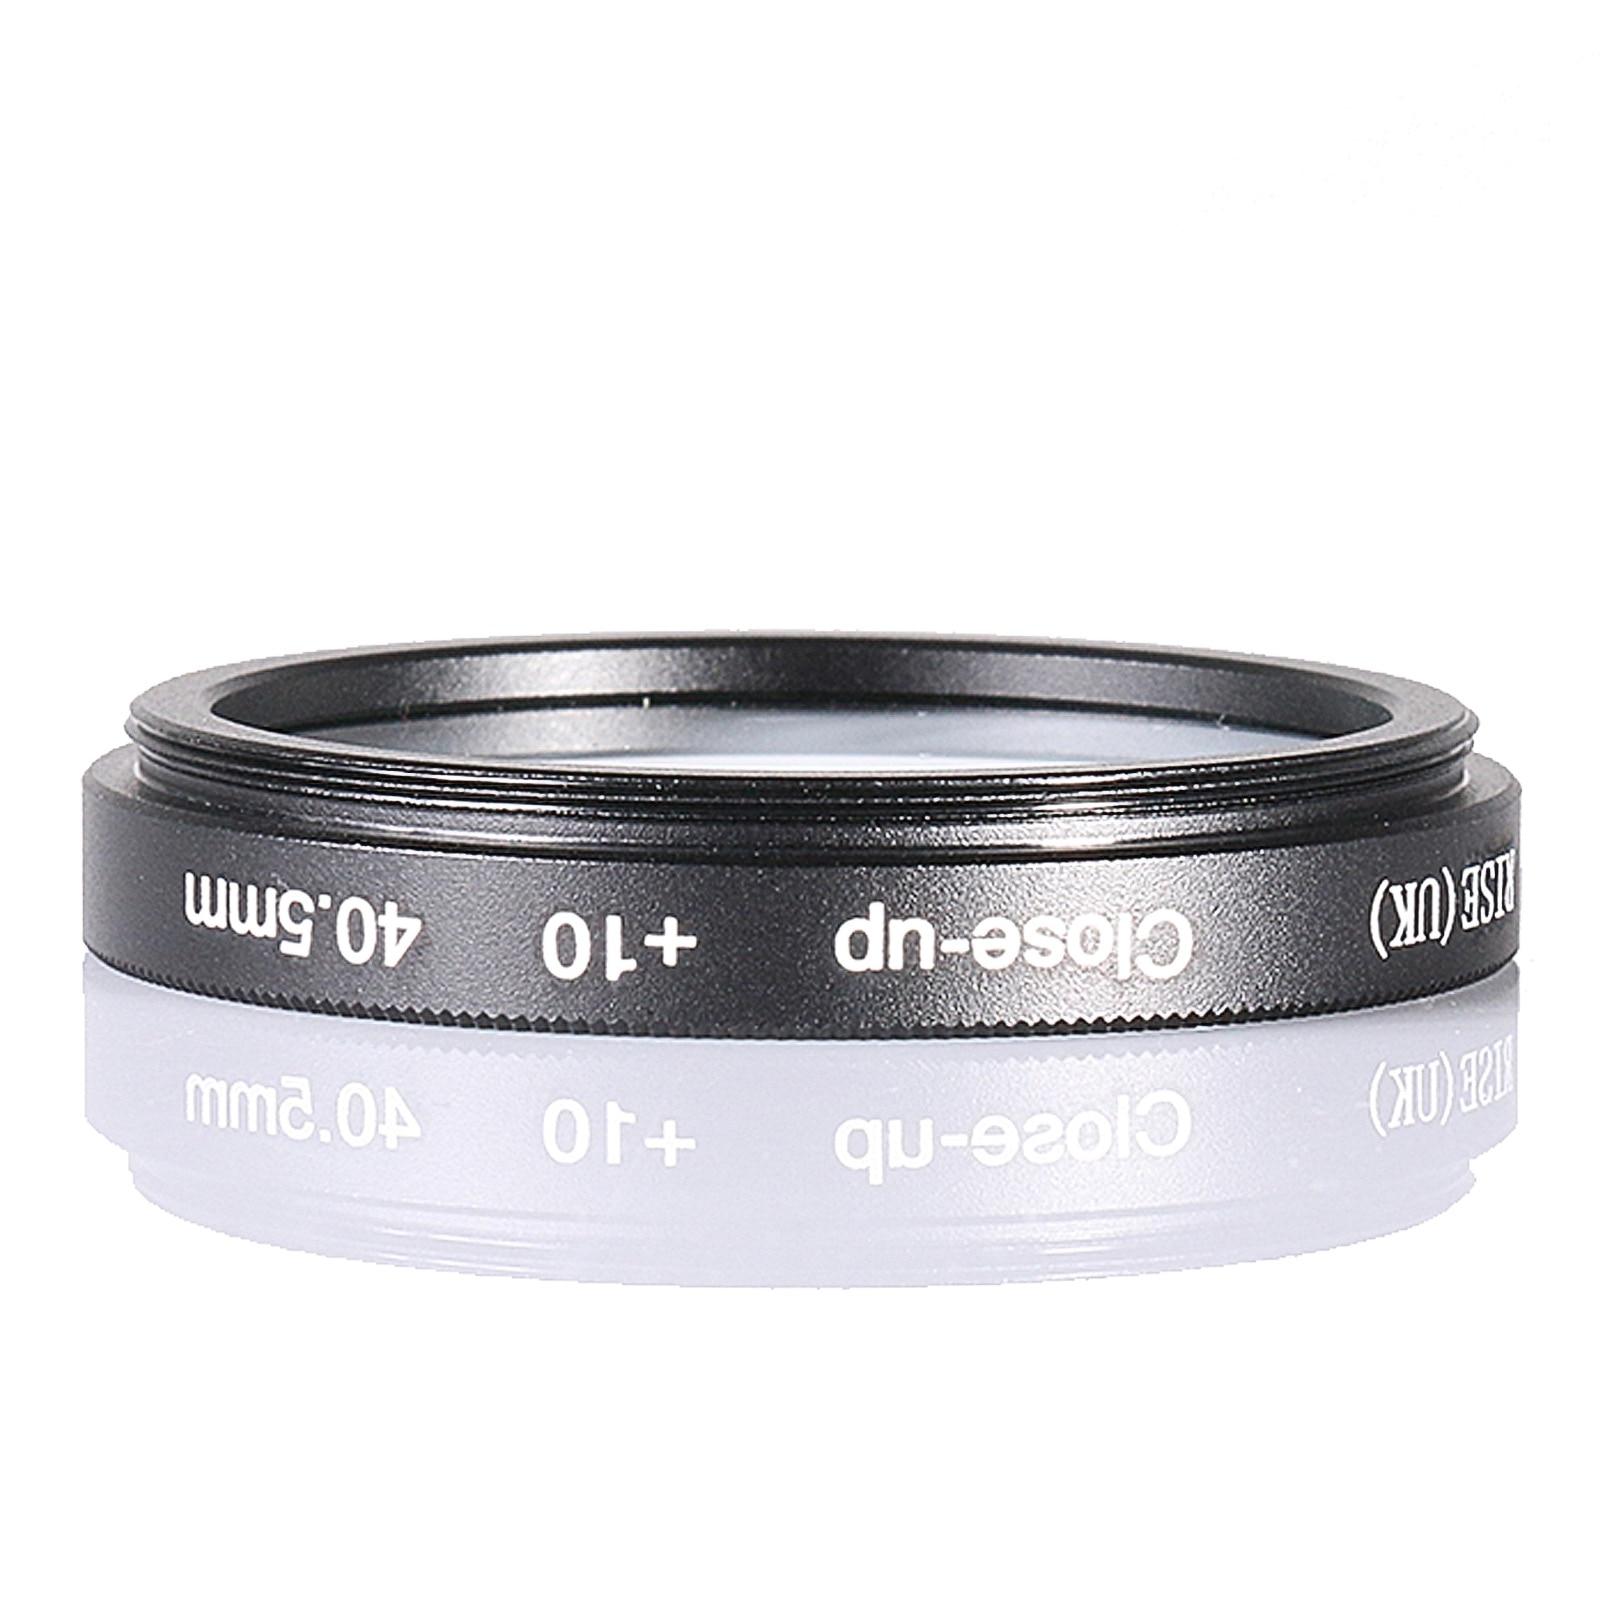 40 5 Mm Macro Close Up 10 Filter Lensa untuk Nikon V1 J1 10 30 Mm 30 110 Mm Kotak di Kamera Filter dari Elektronik konsumen AliExpress